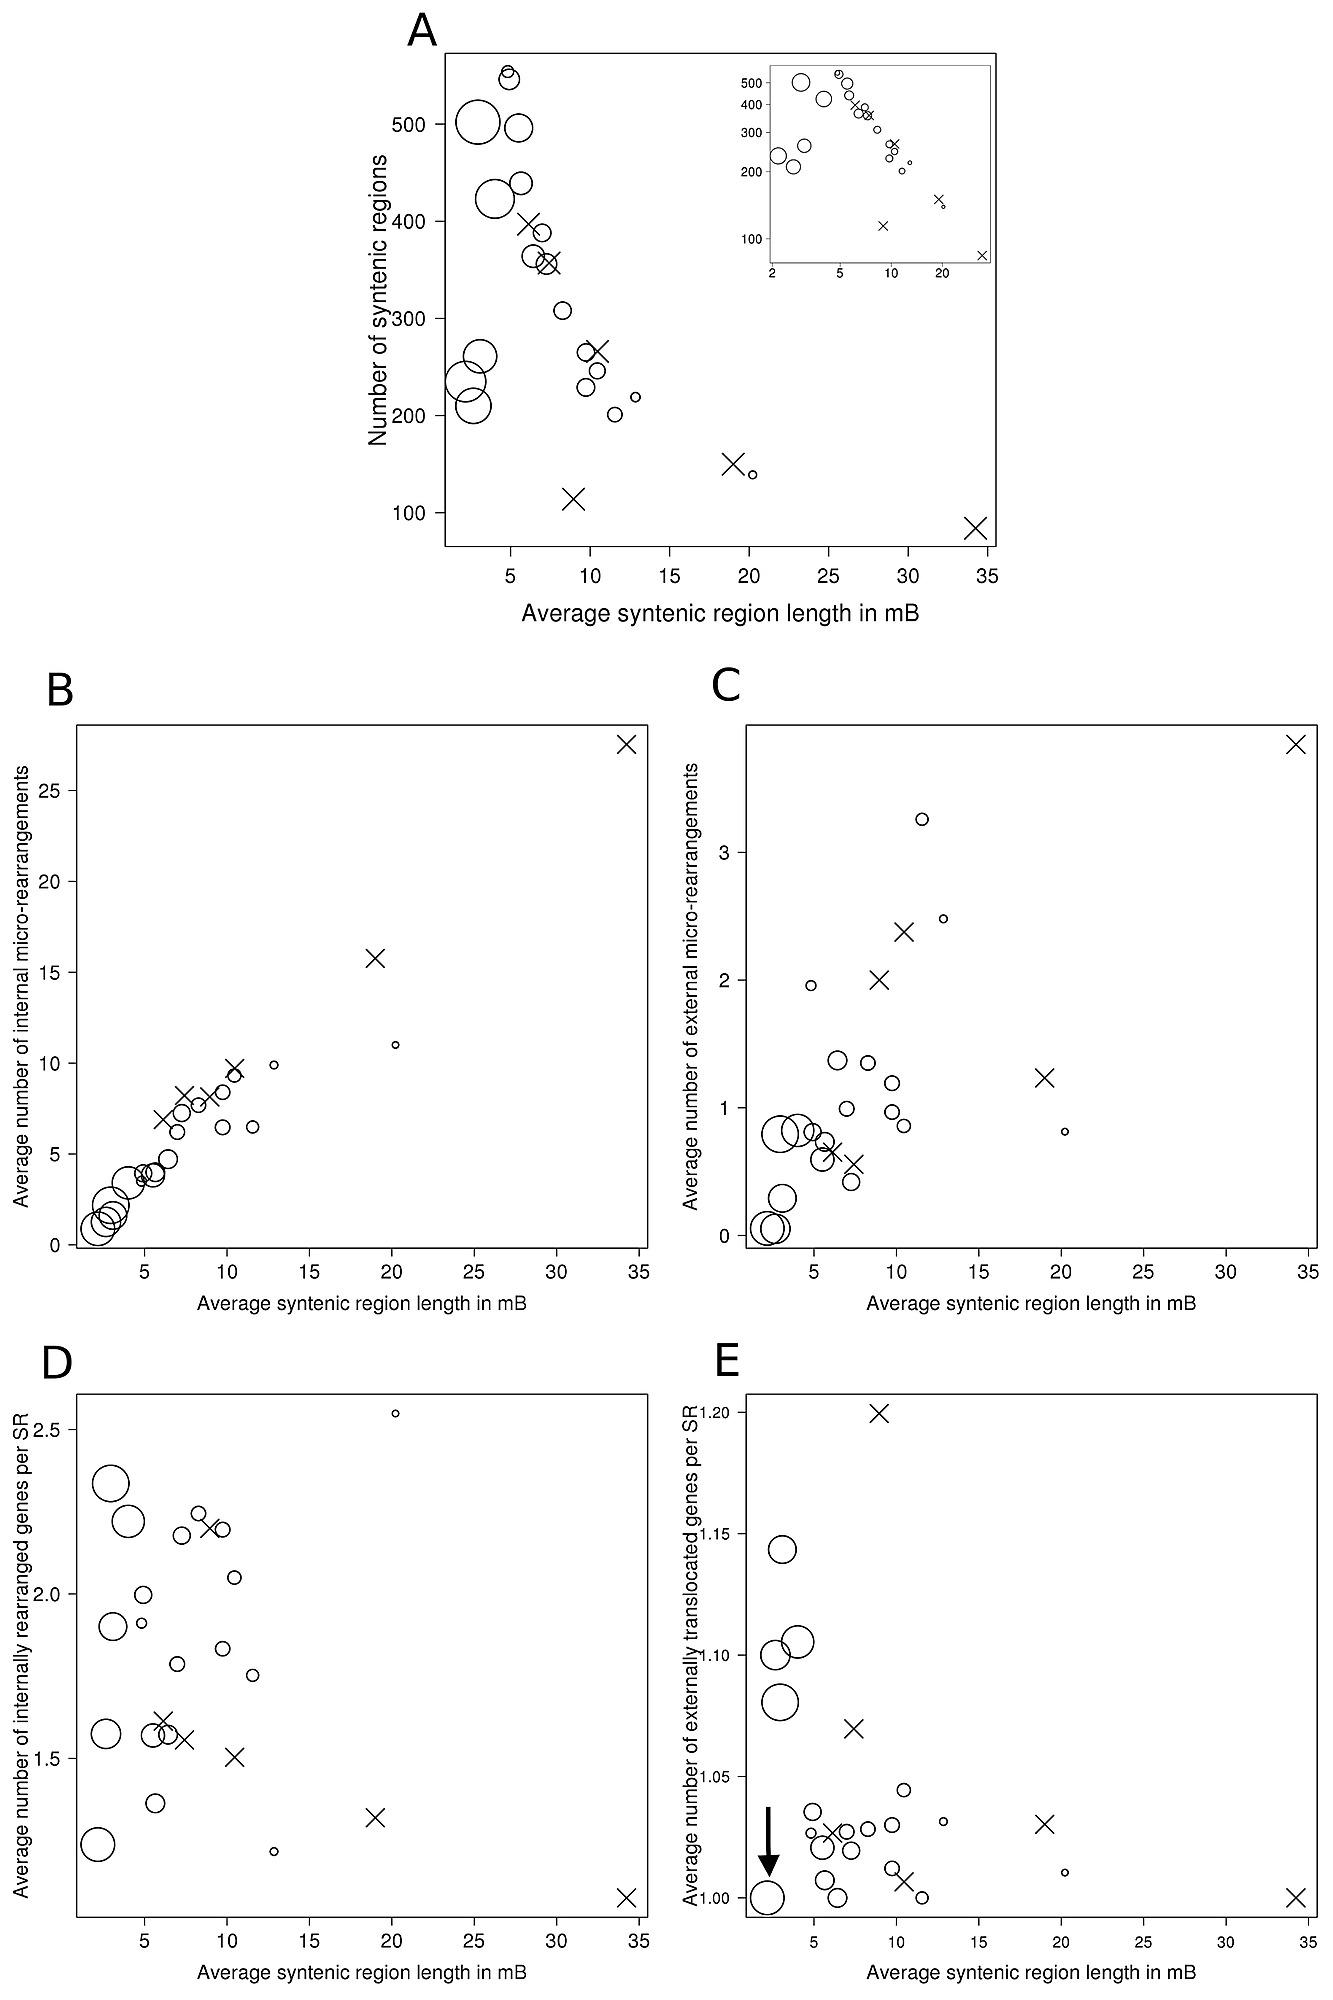 Relationship of syntenic region length, evolutionary